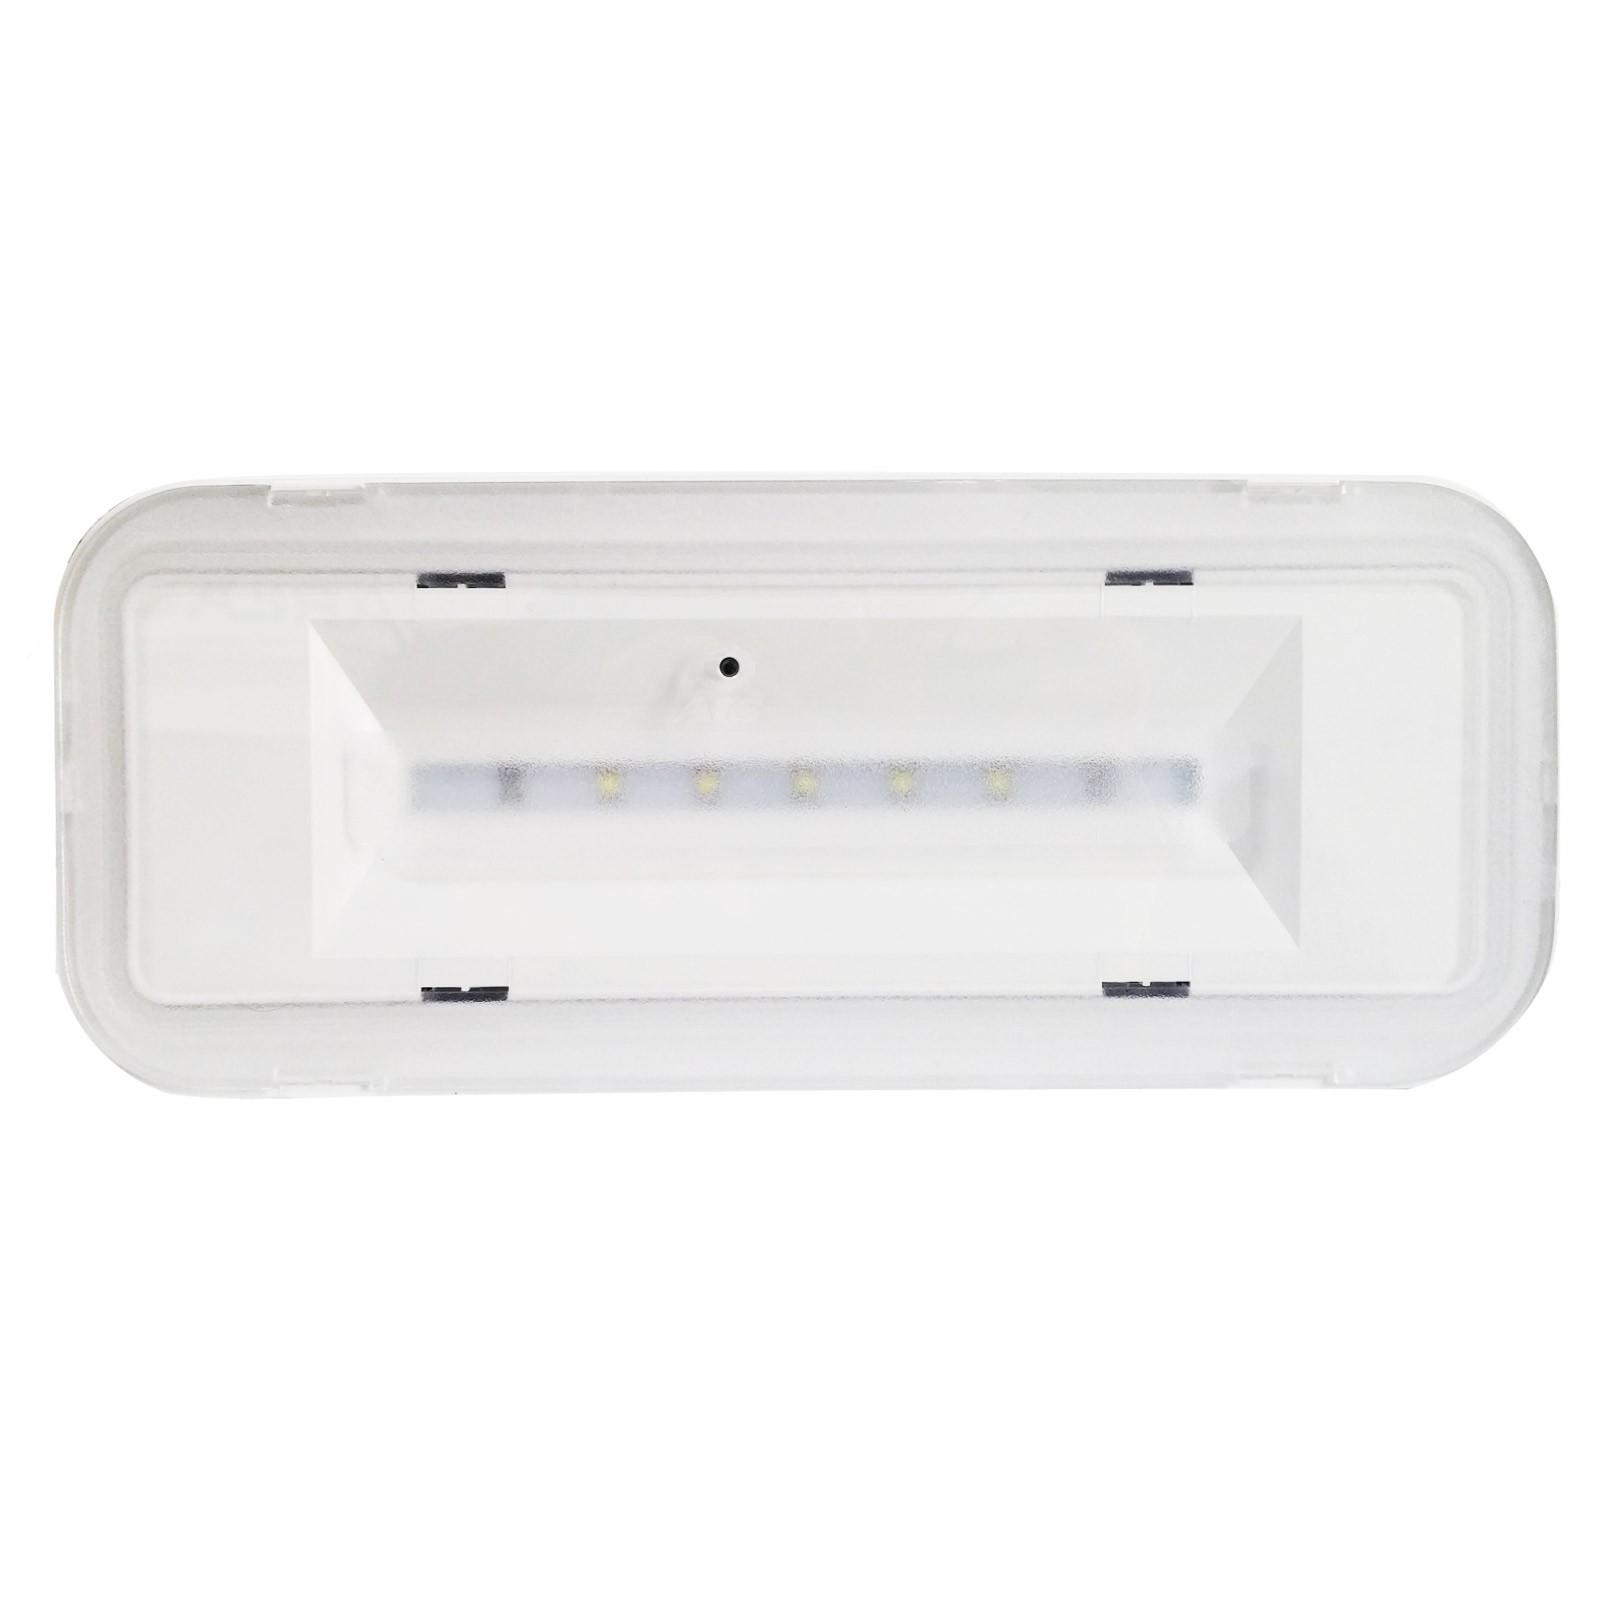 Ova Lampade Emergenza Catalogo.Luci D Emergenza Illuminazione A Led Area Illumina